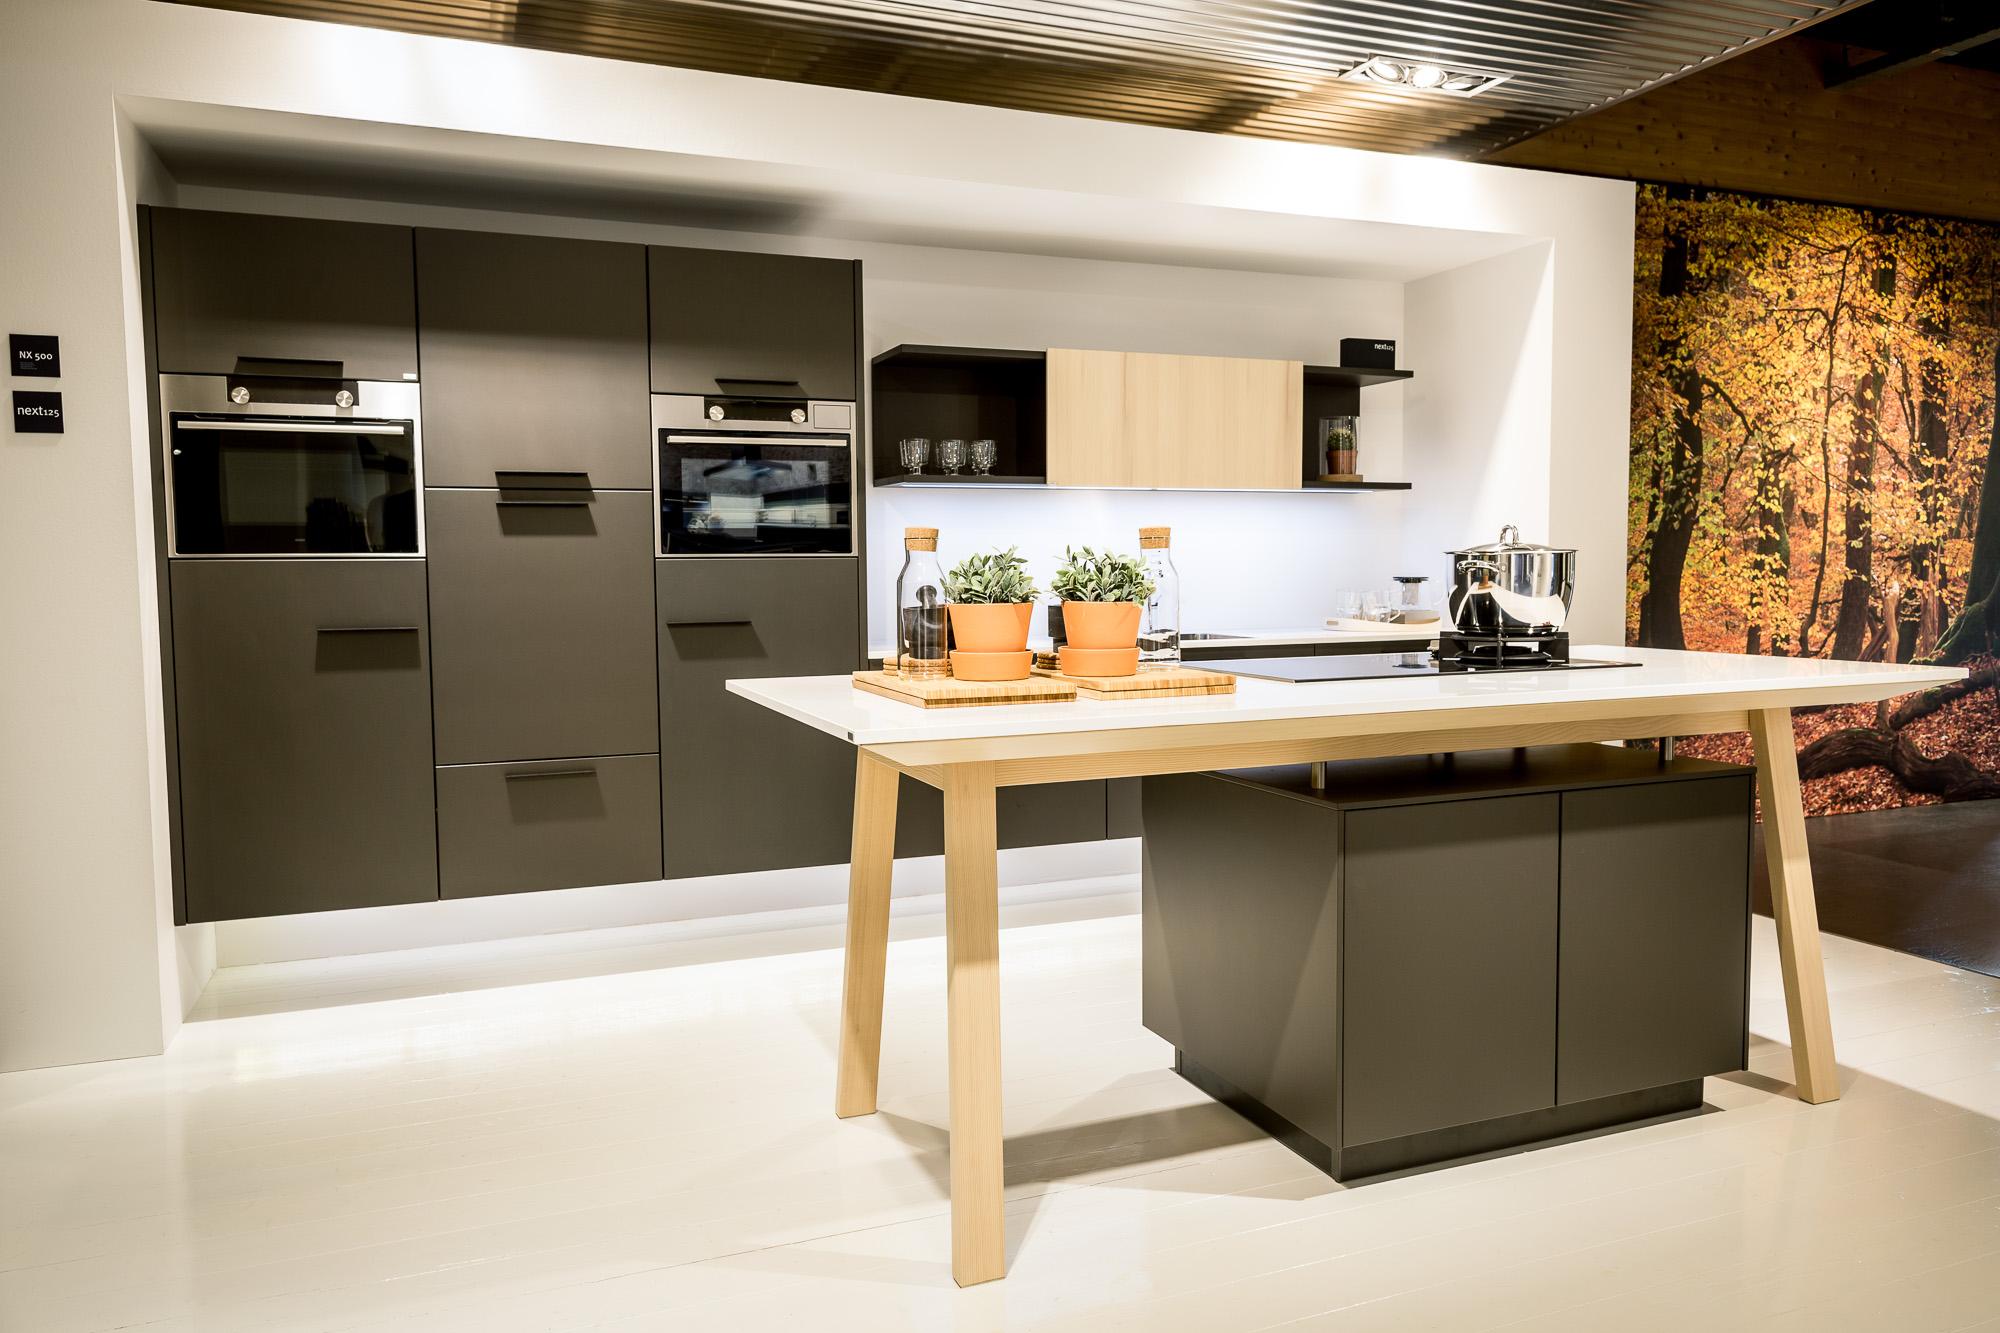 Strakke Design Keukens : Concordia keuken & bad keukens strakke design keuken next125